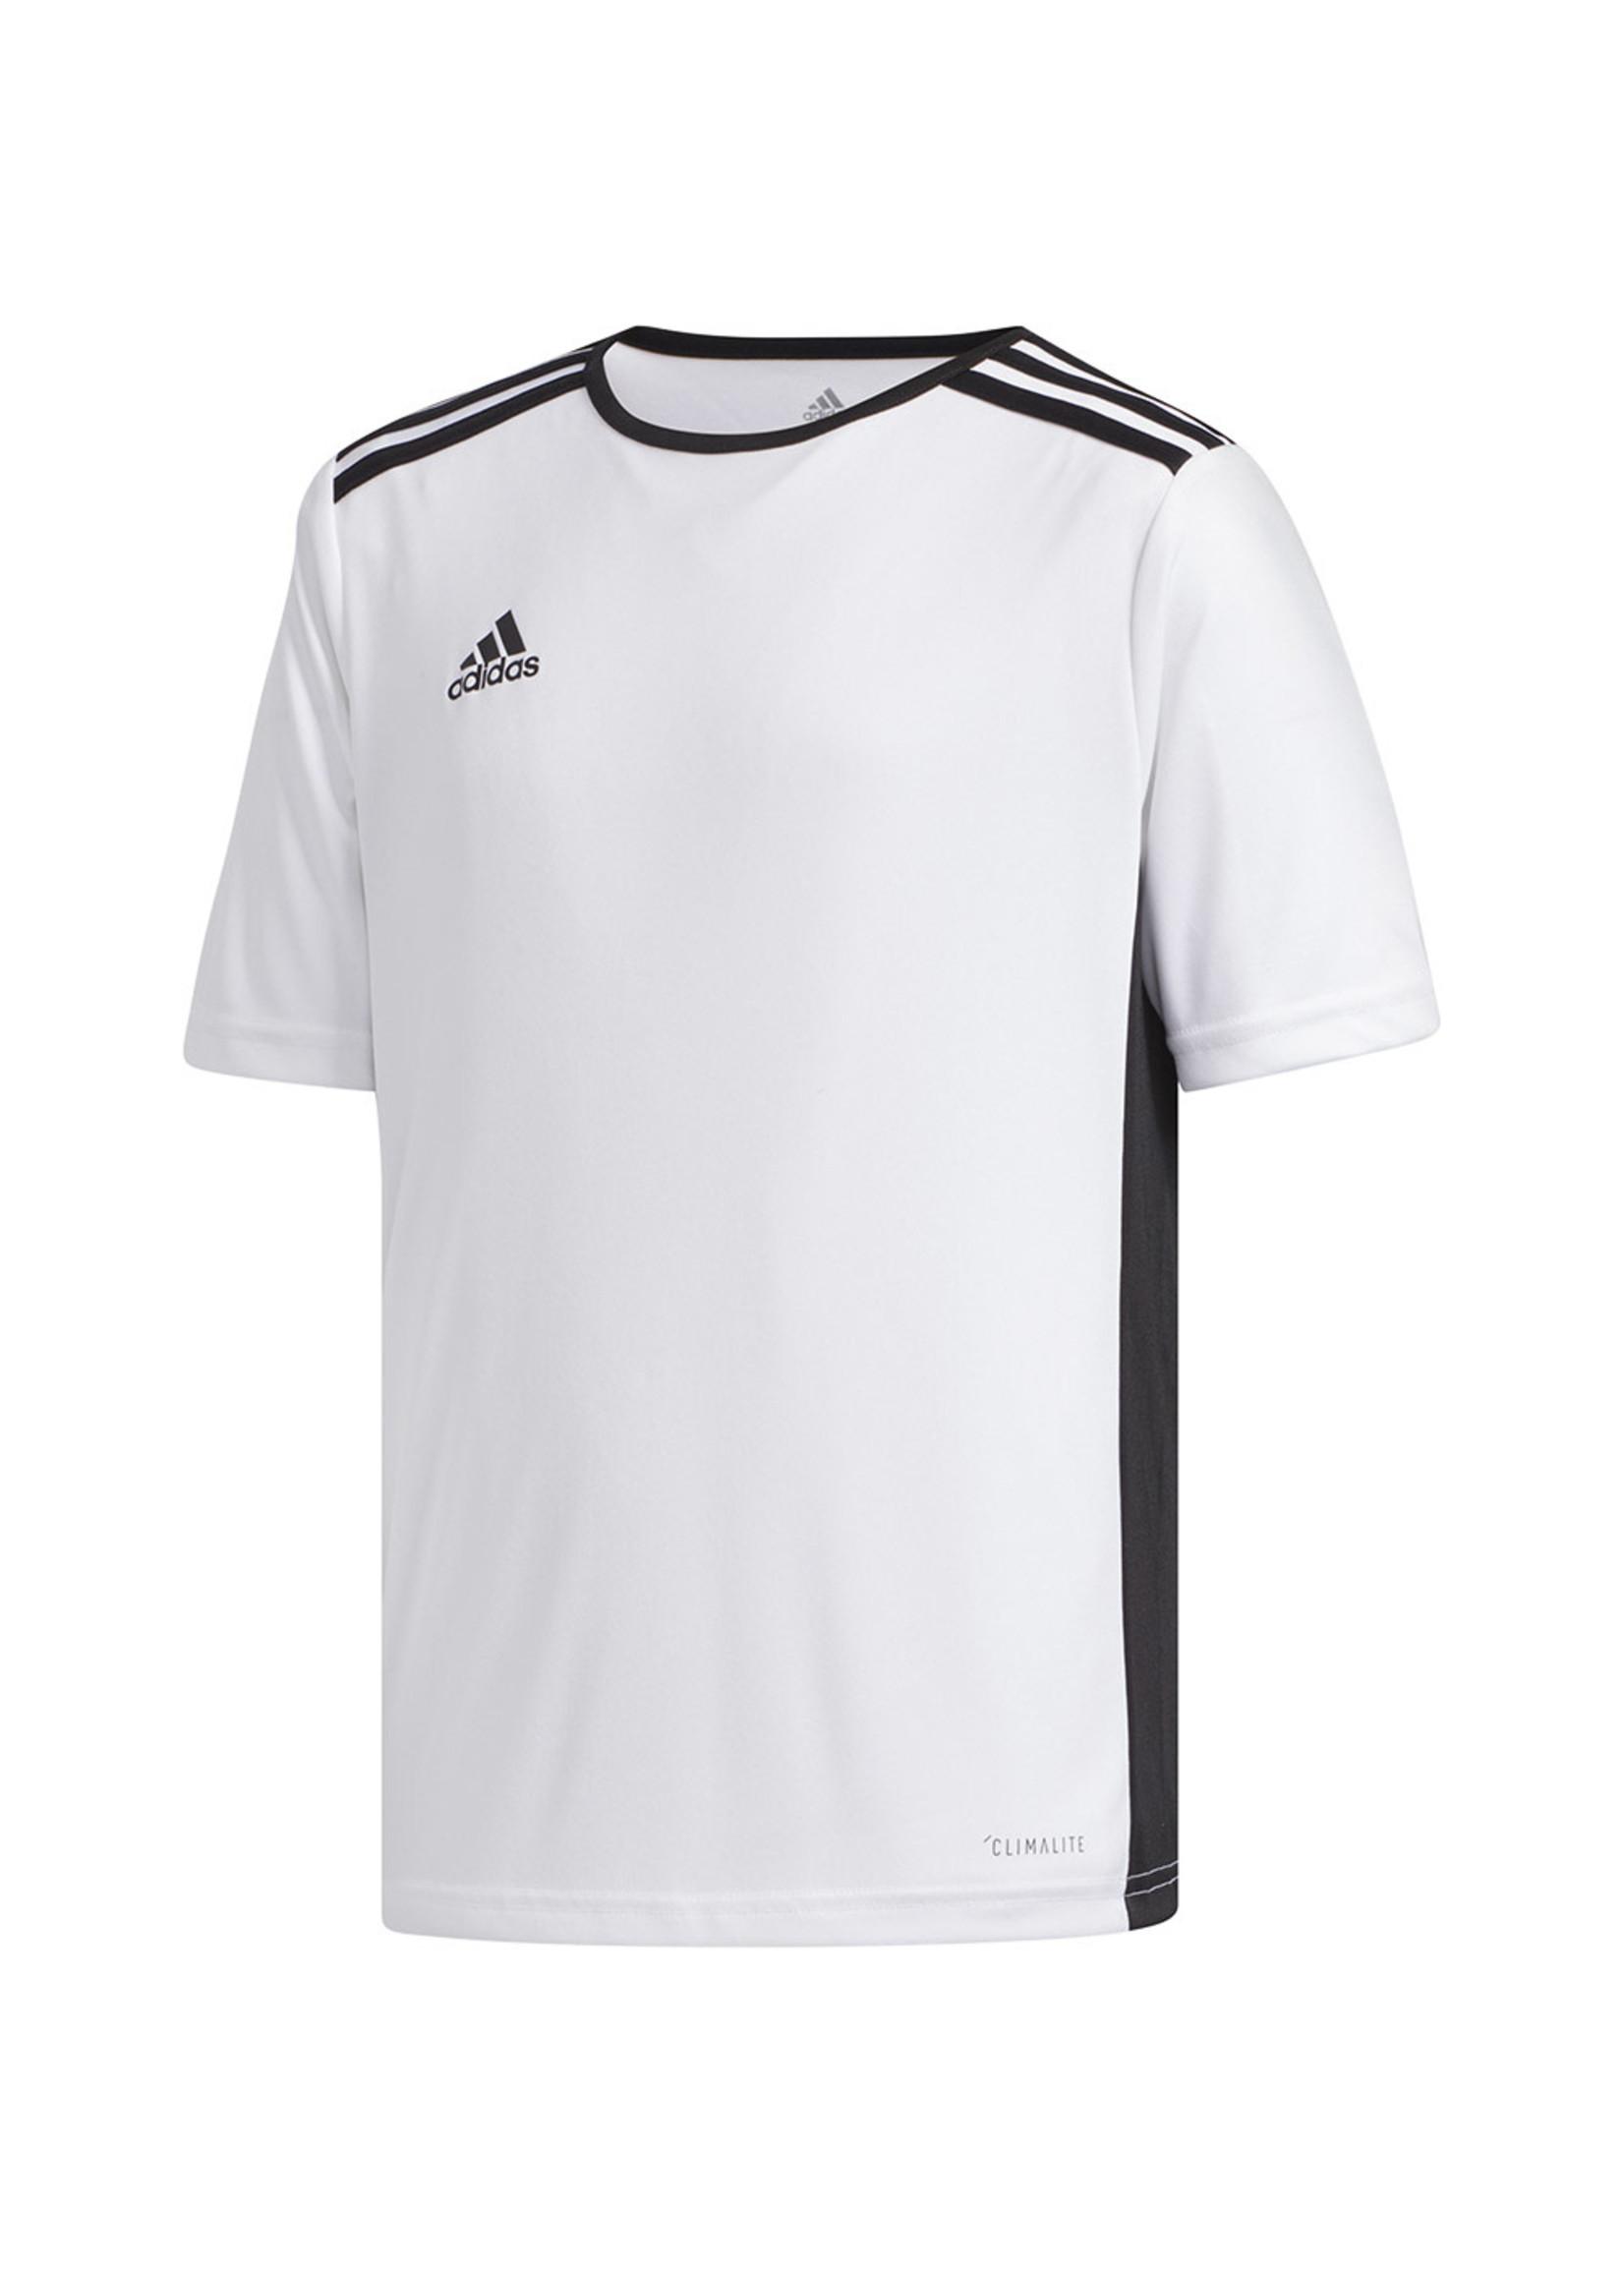 Adidas Entrada 18 Jersey White Youth